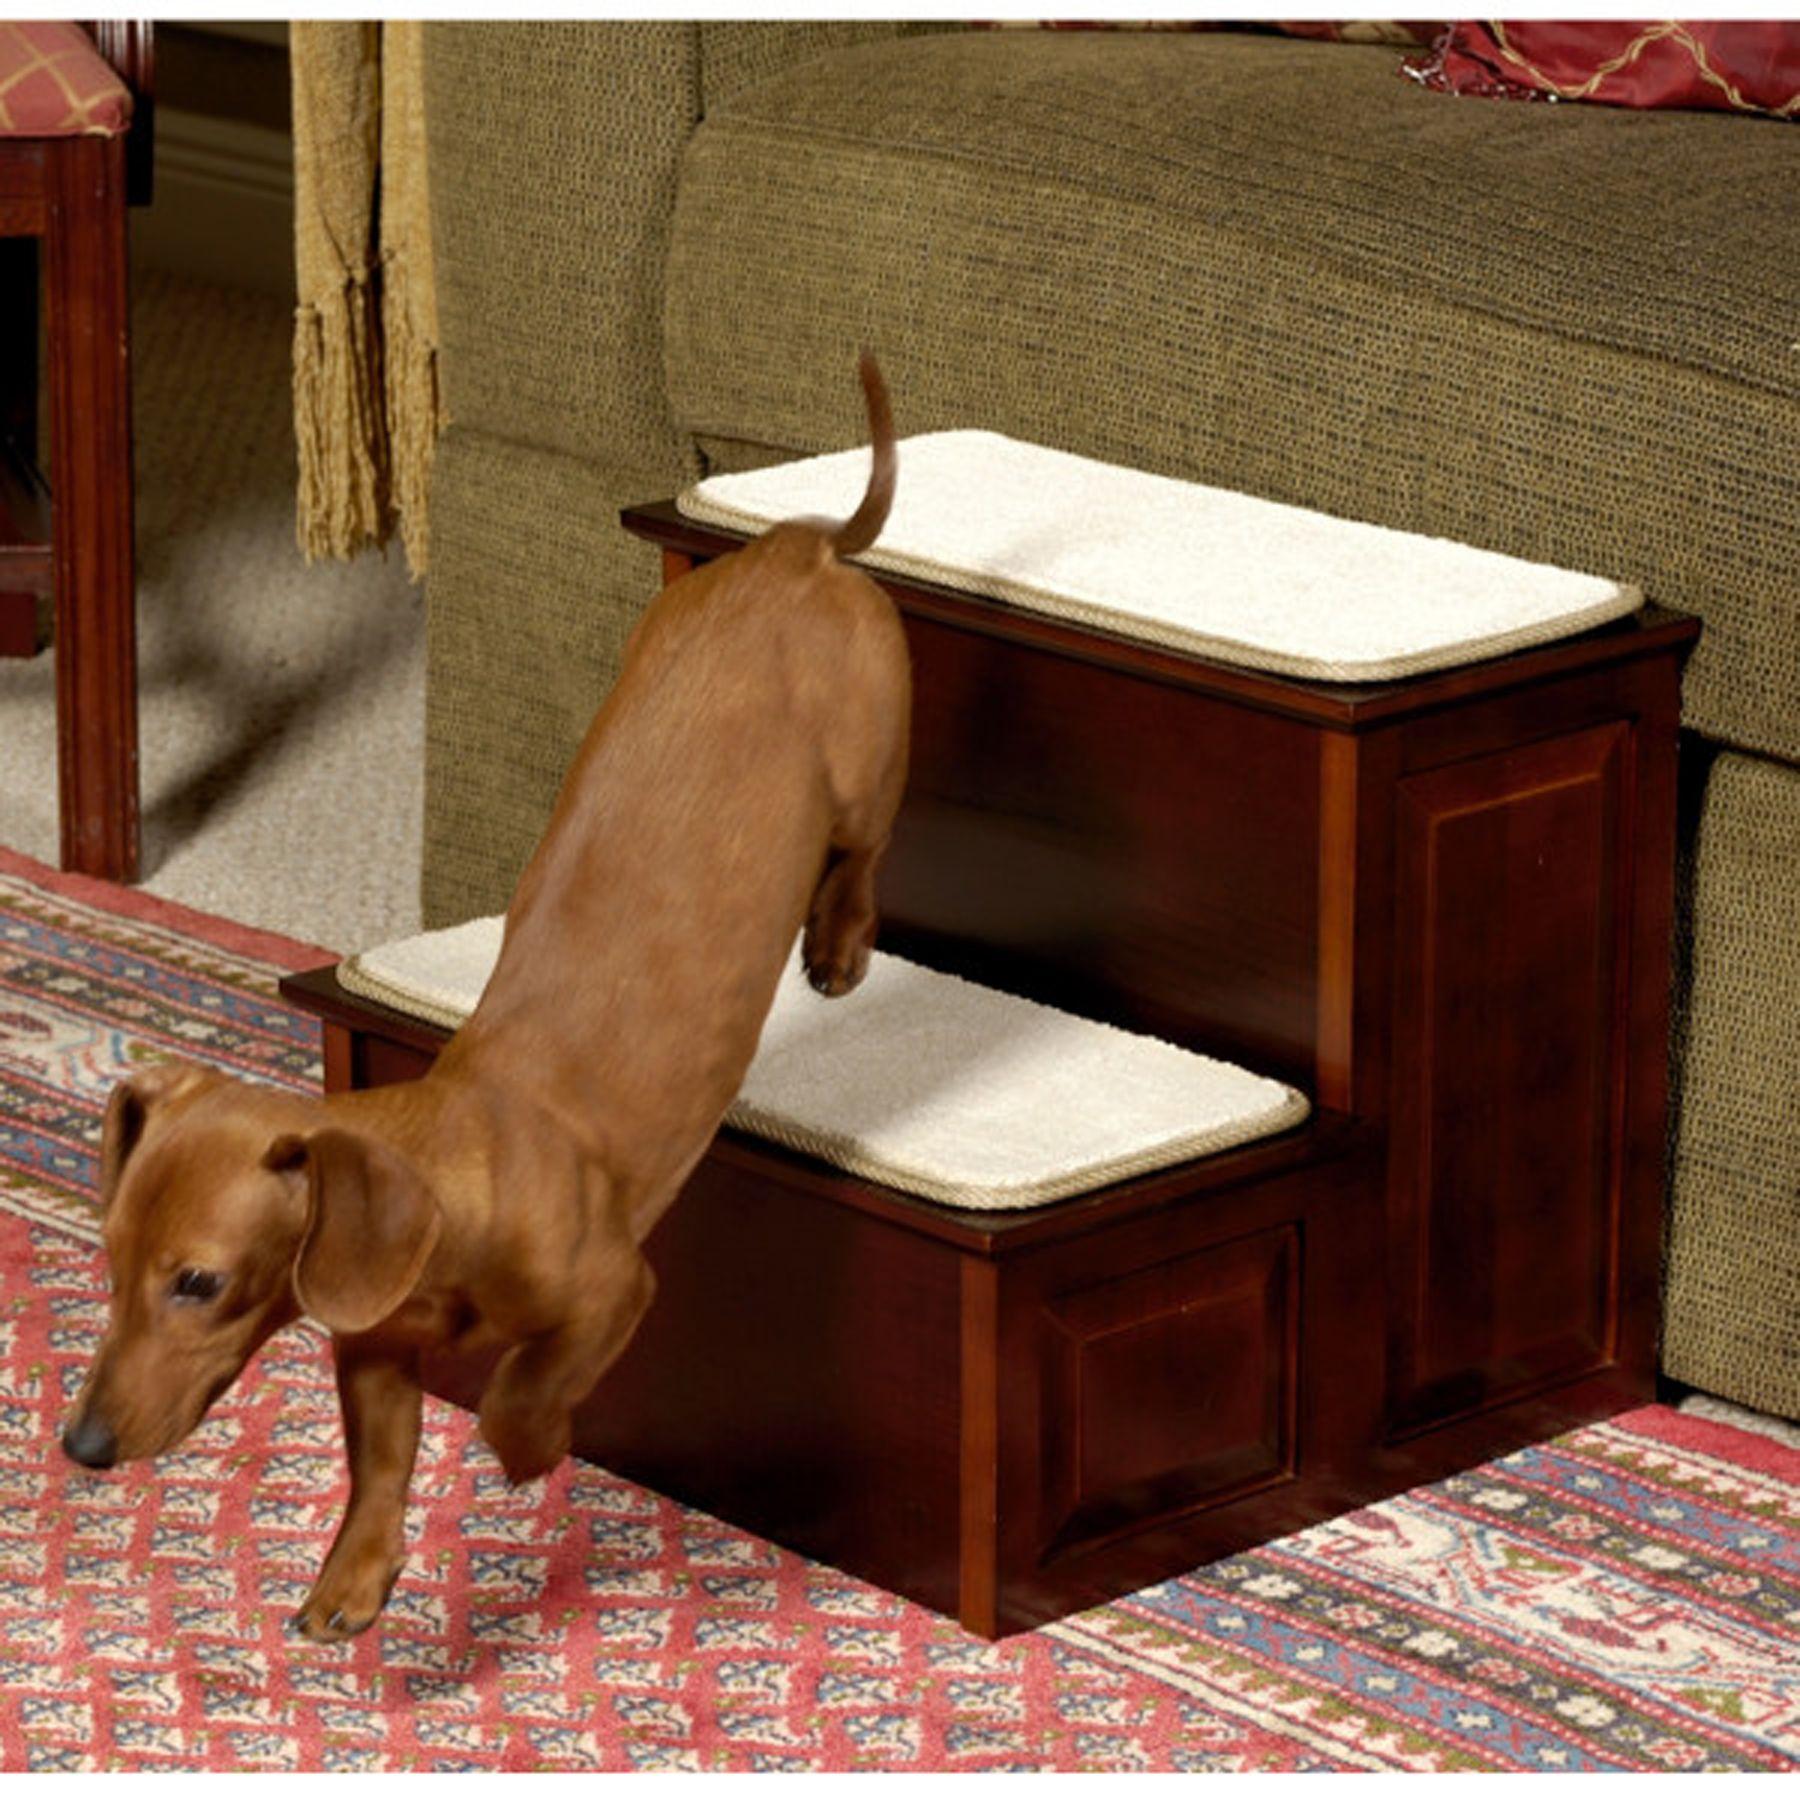 Mr. Herzhers Decorative 2 Step Pet Step Size 16l X 17w X 14h Red Mr. Herzhers